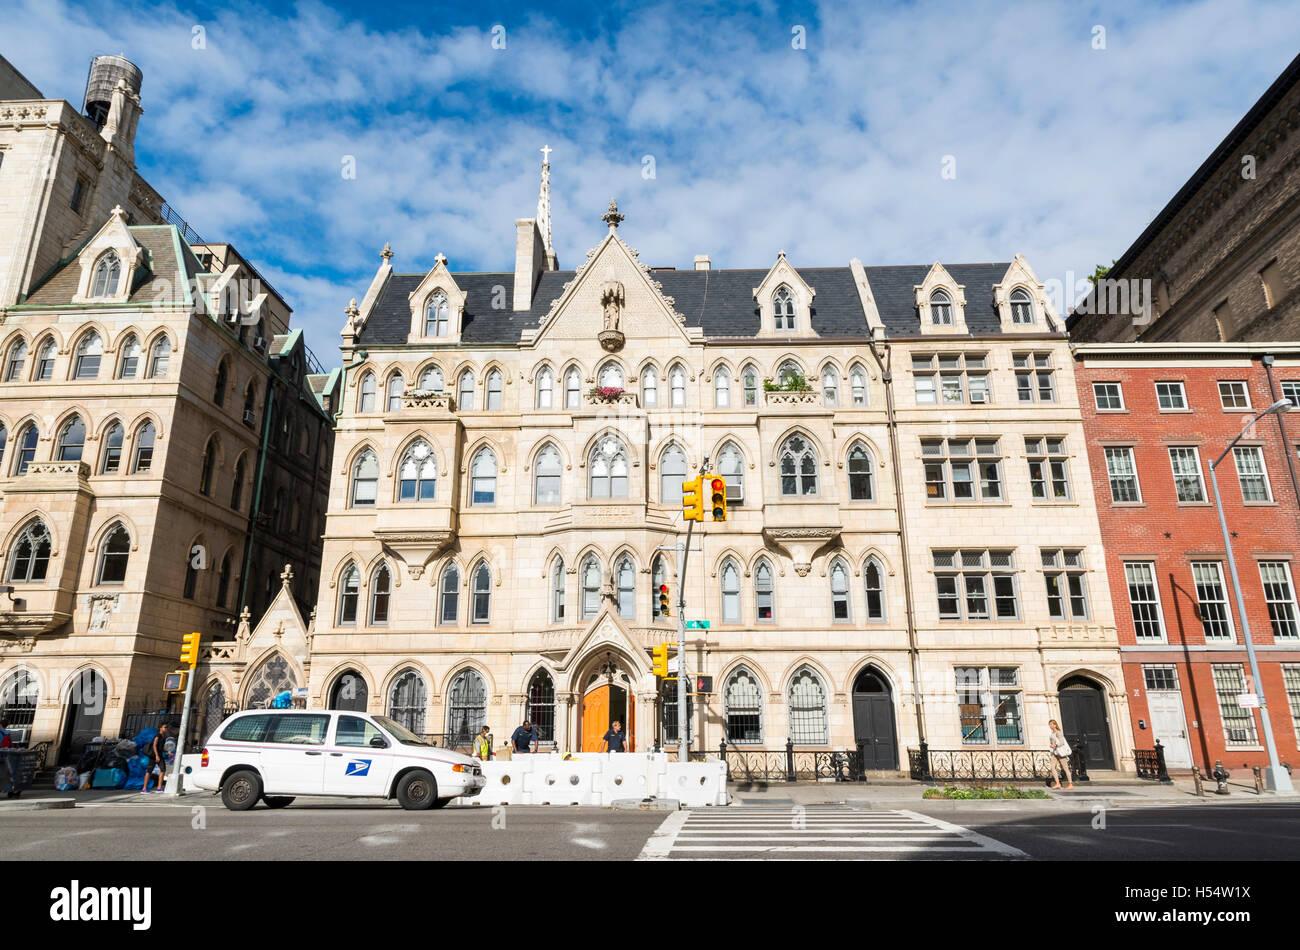 Landmarked Grace Memorial House, Neighborhood House, and Clergy House on Fourth Avenue, New York. Stock Photo